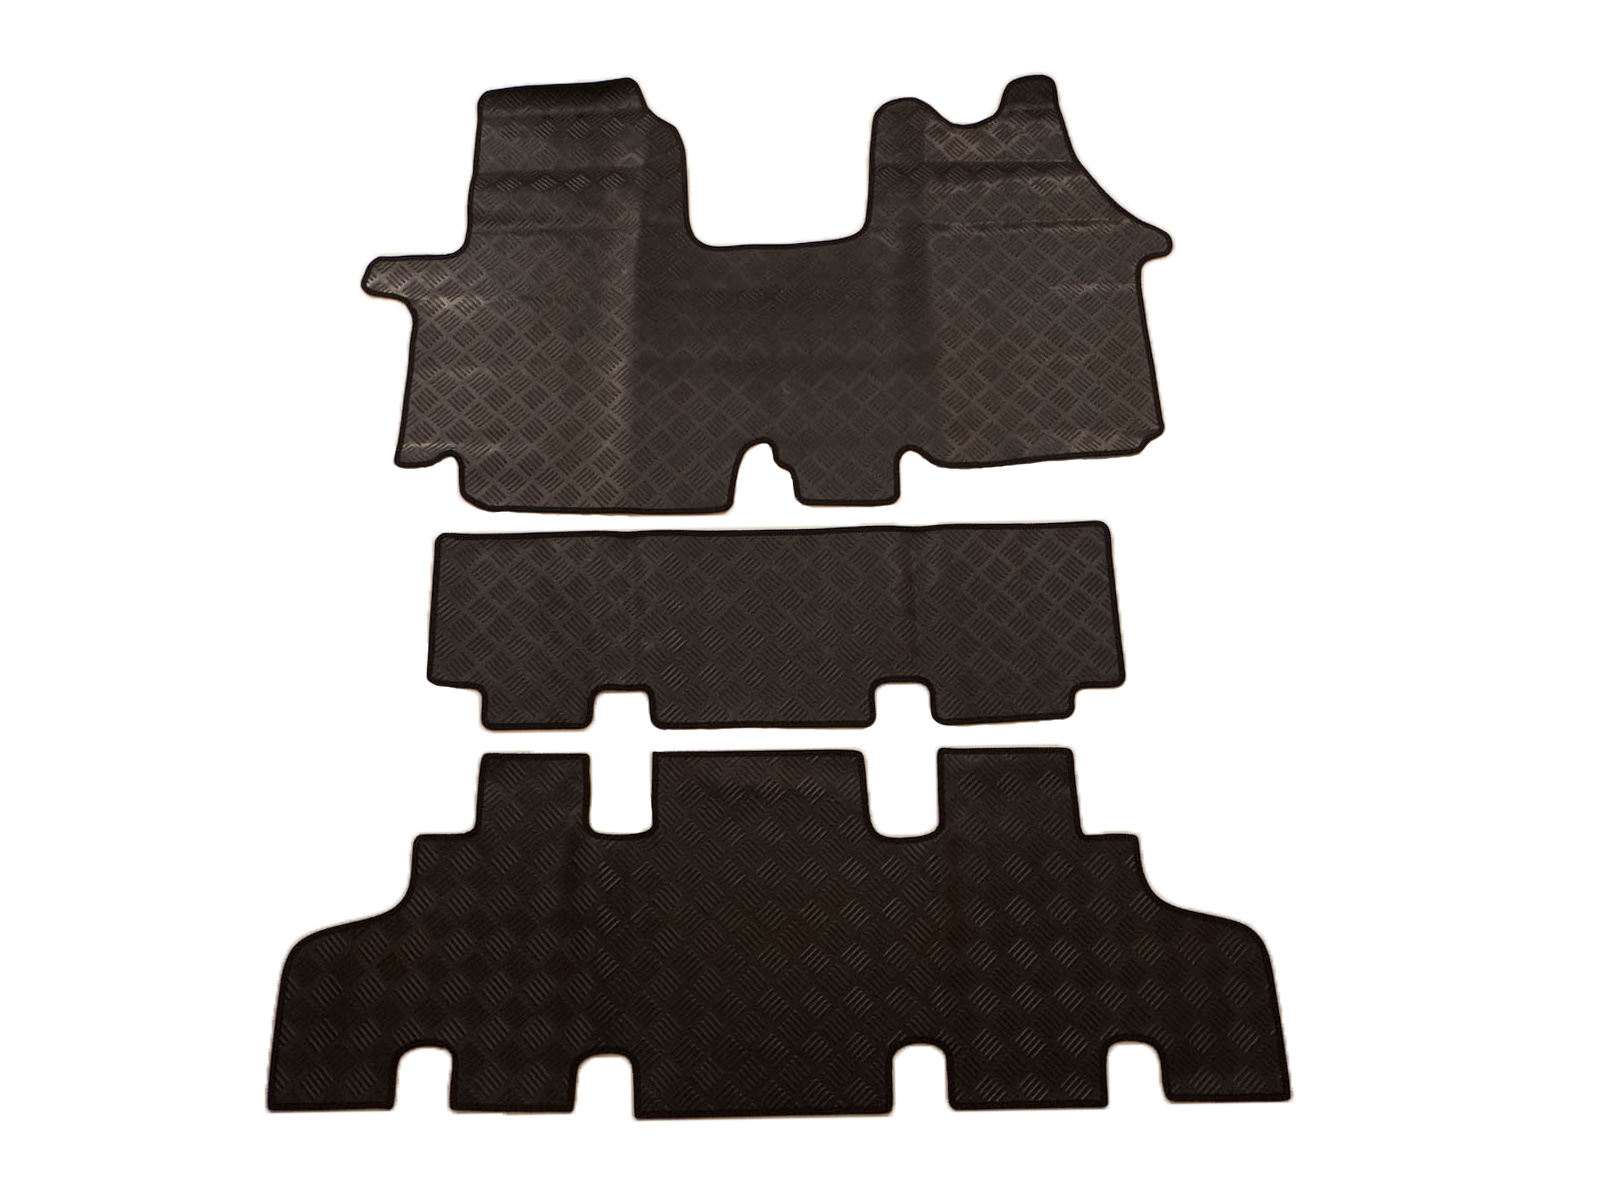 Rubber floor mat jigsaw - Tailored Heavy Duty Black Rubber Floor Mats For Renault Trafic Minibus 02 14